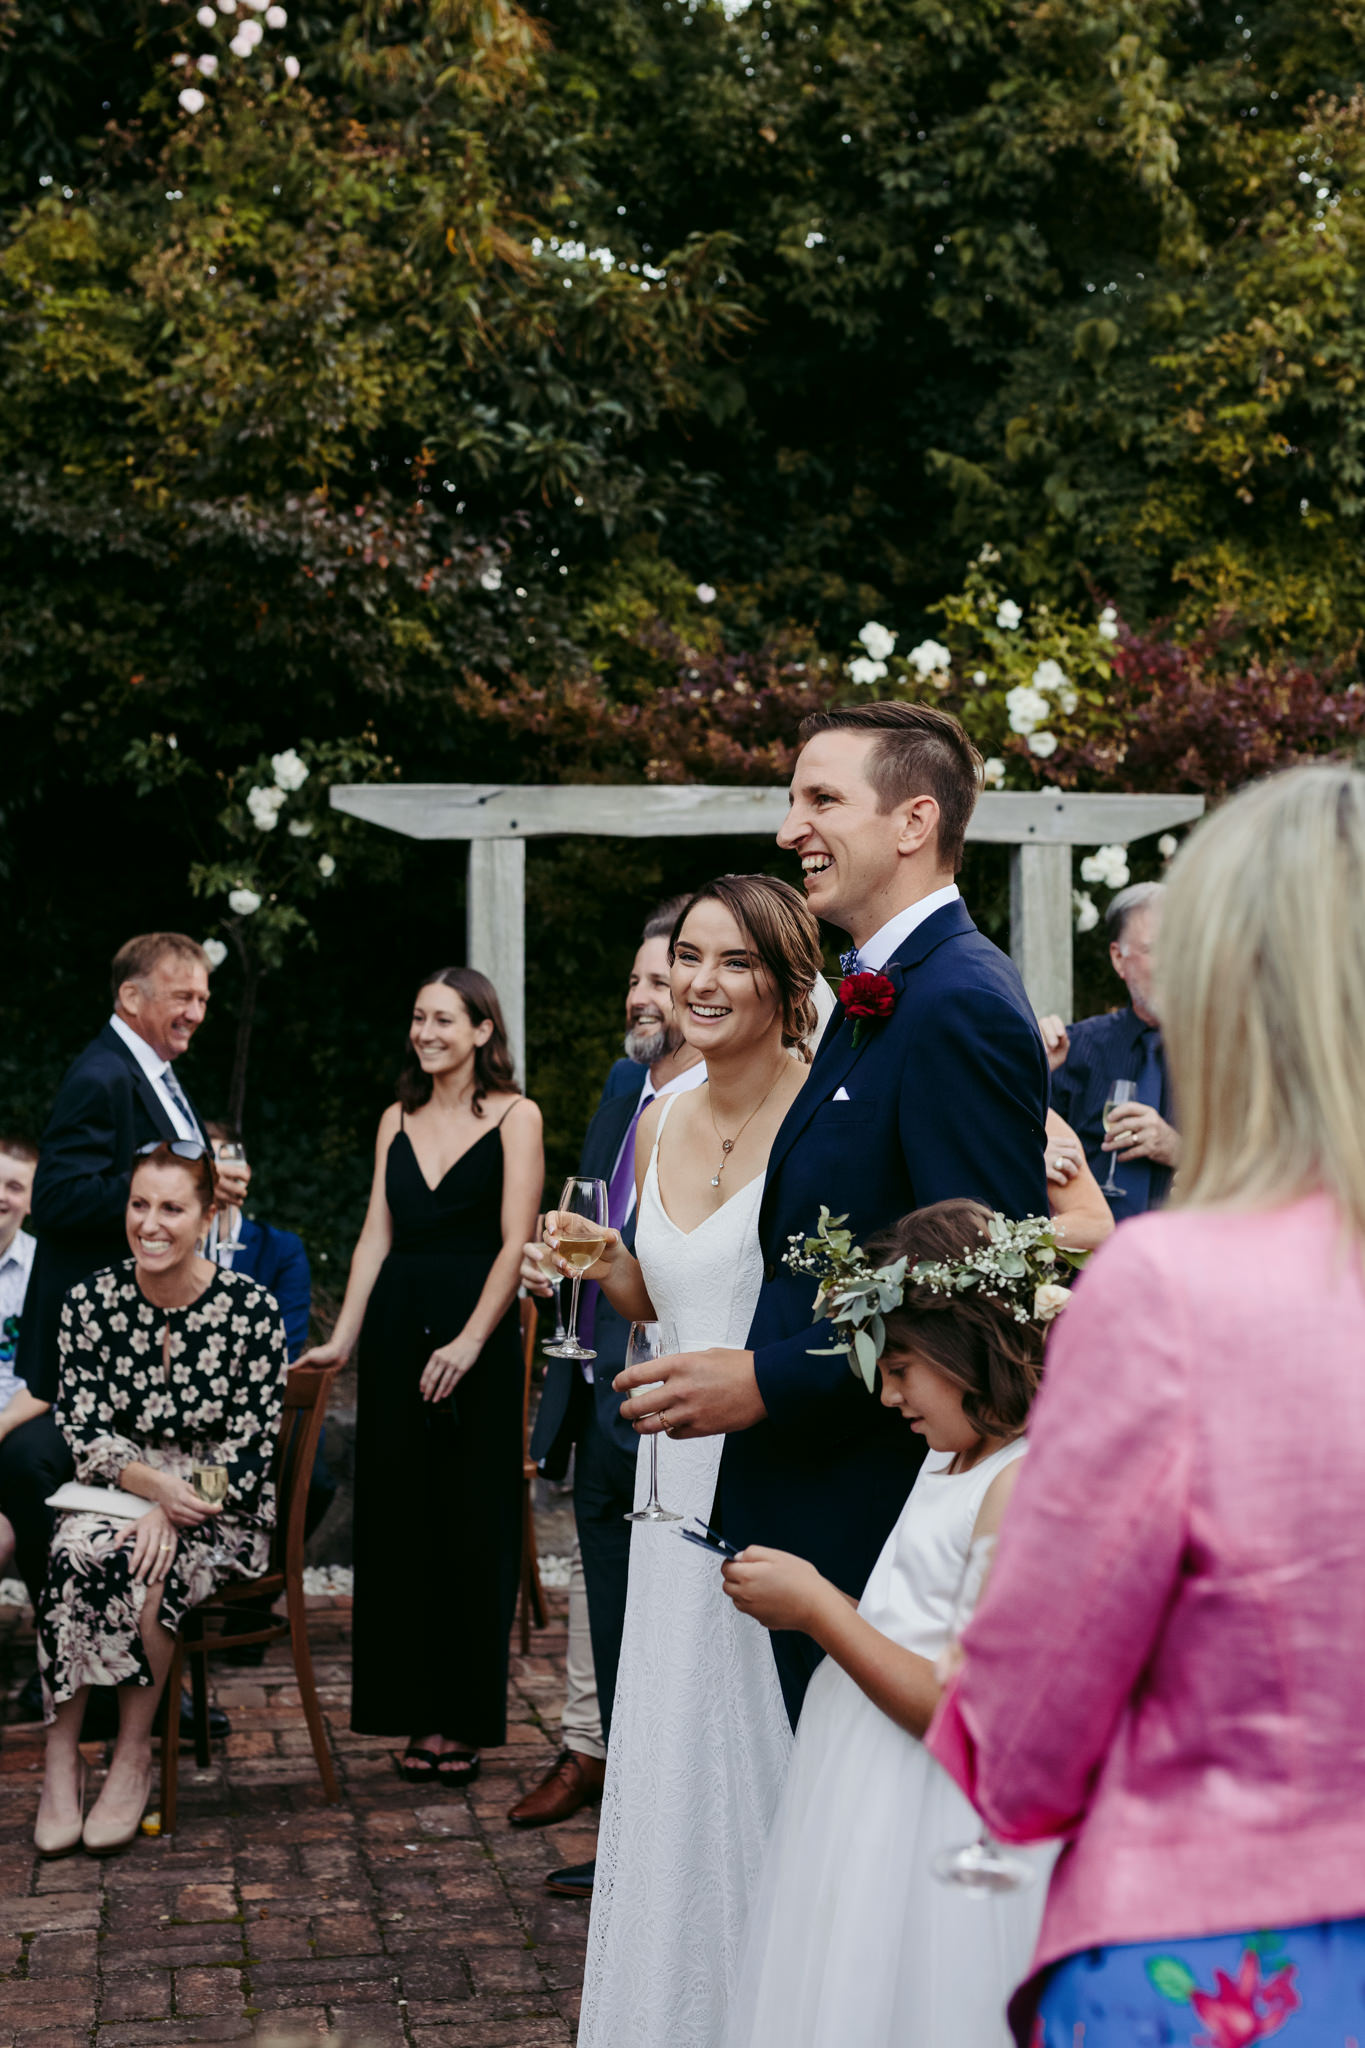 Erin Latimore Mudgee Canberra Wedding Photographer ROSEBANK GUESTHOUSE OLD THEATRE TONIC MILLTHORPE_616.JPG